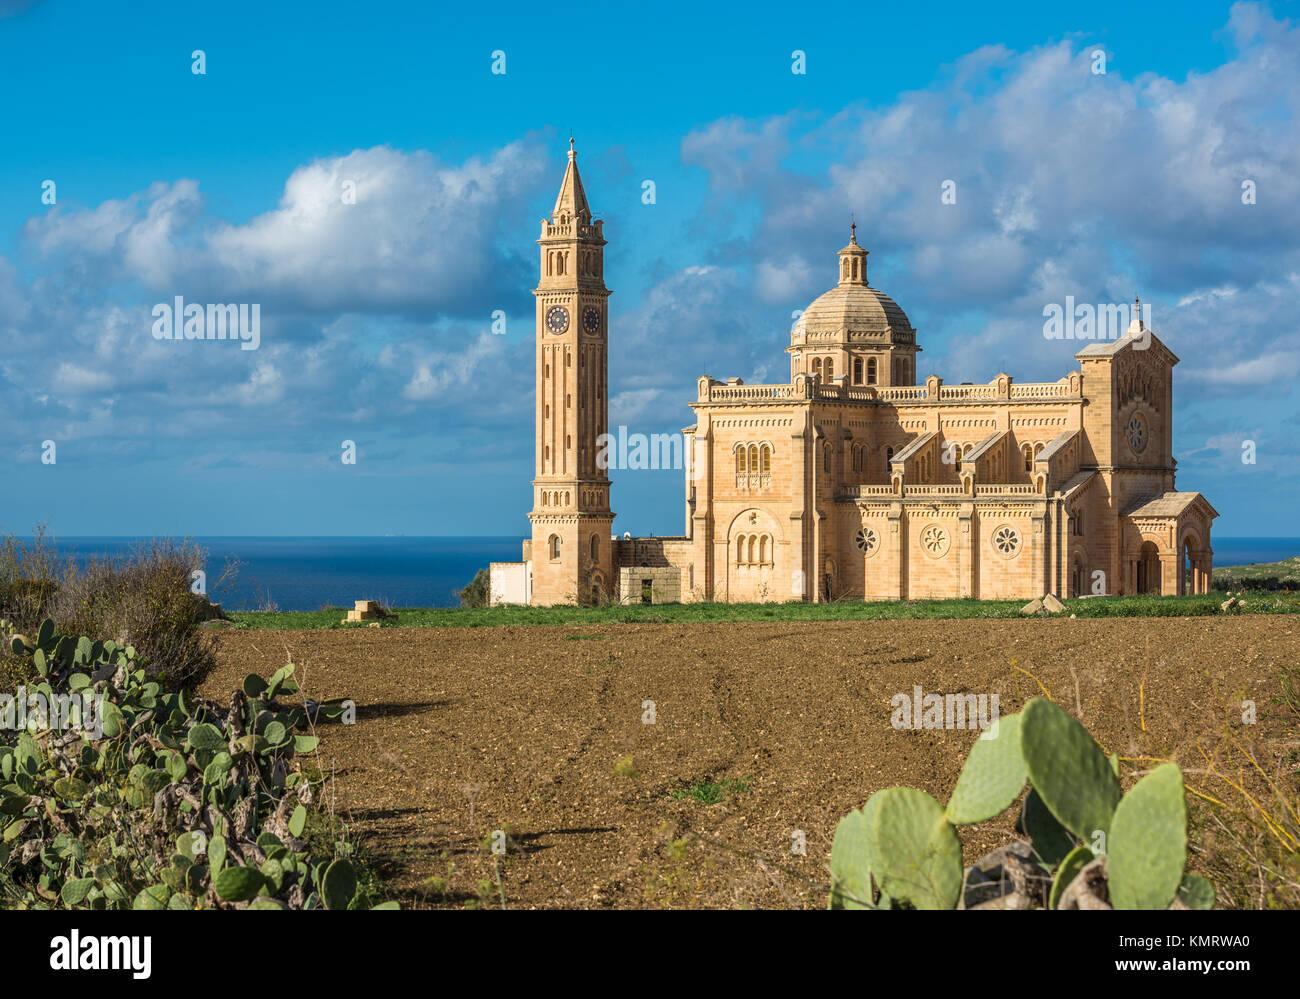 La Basílica del Santuario Nacional de la Virgen de Ta Pinu, en Gozo, Malta Foto de stock